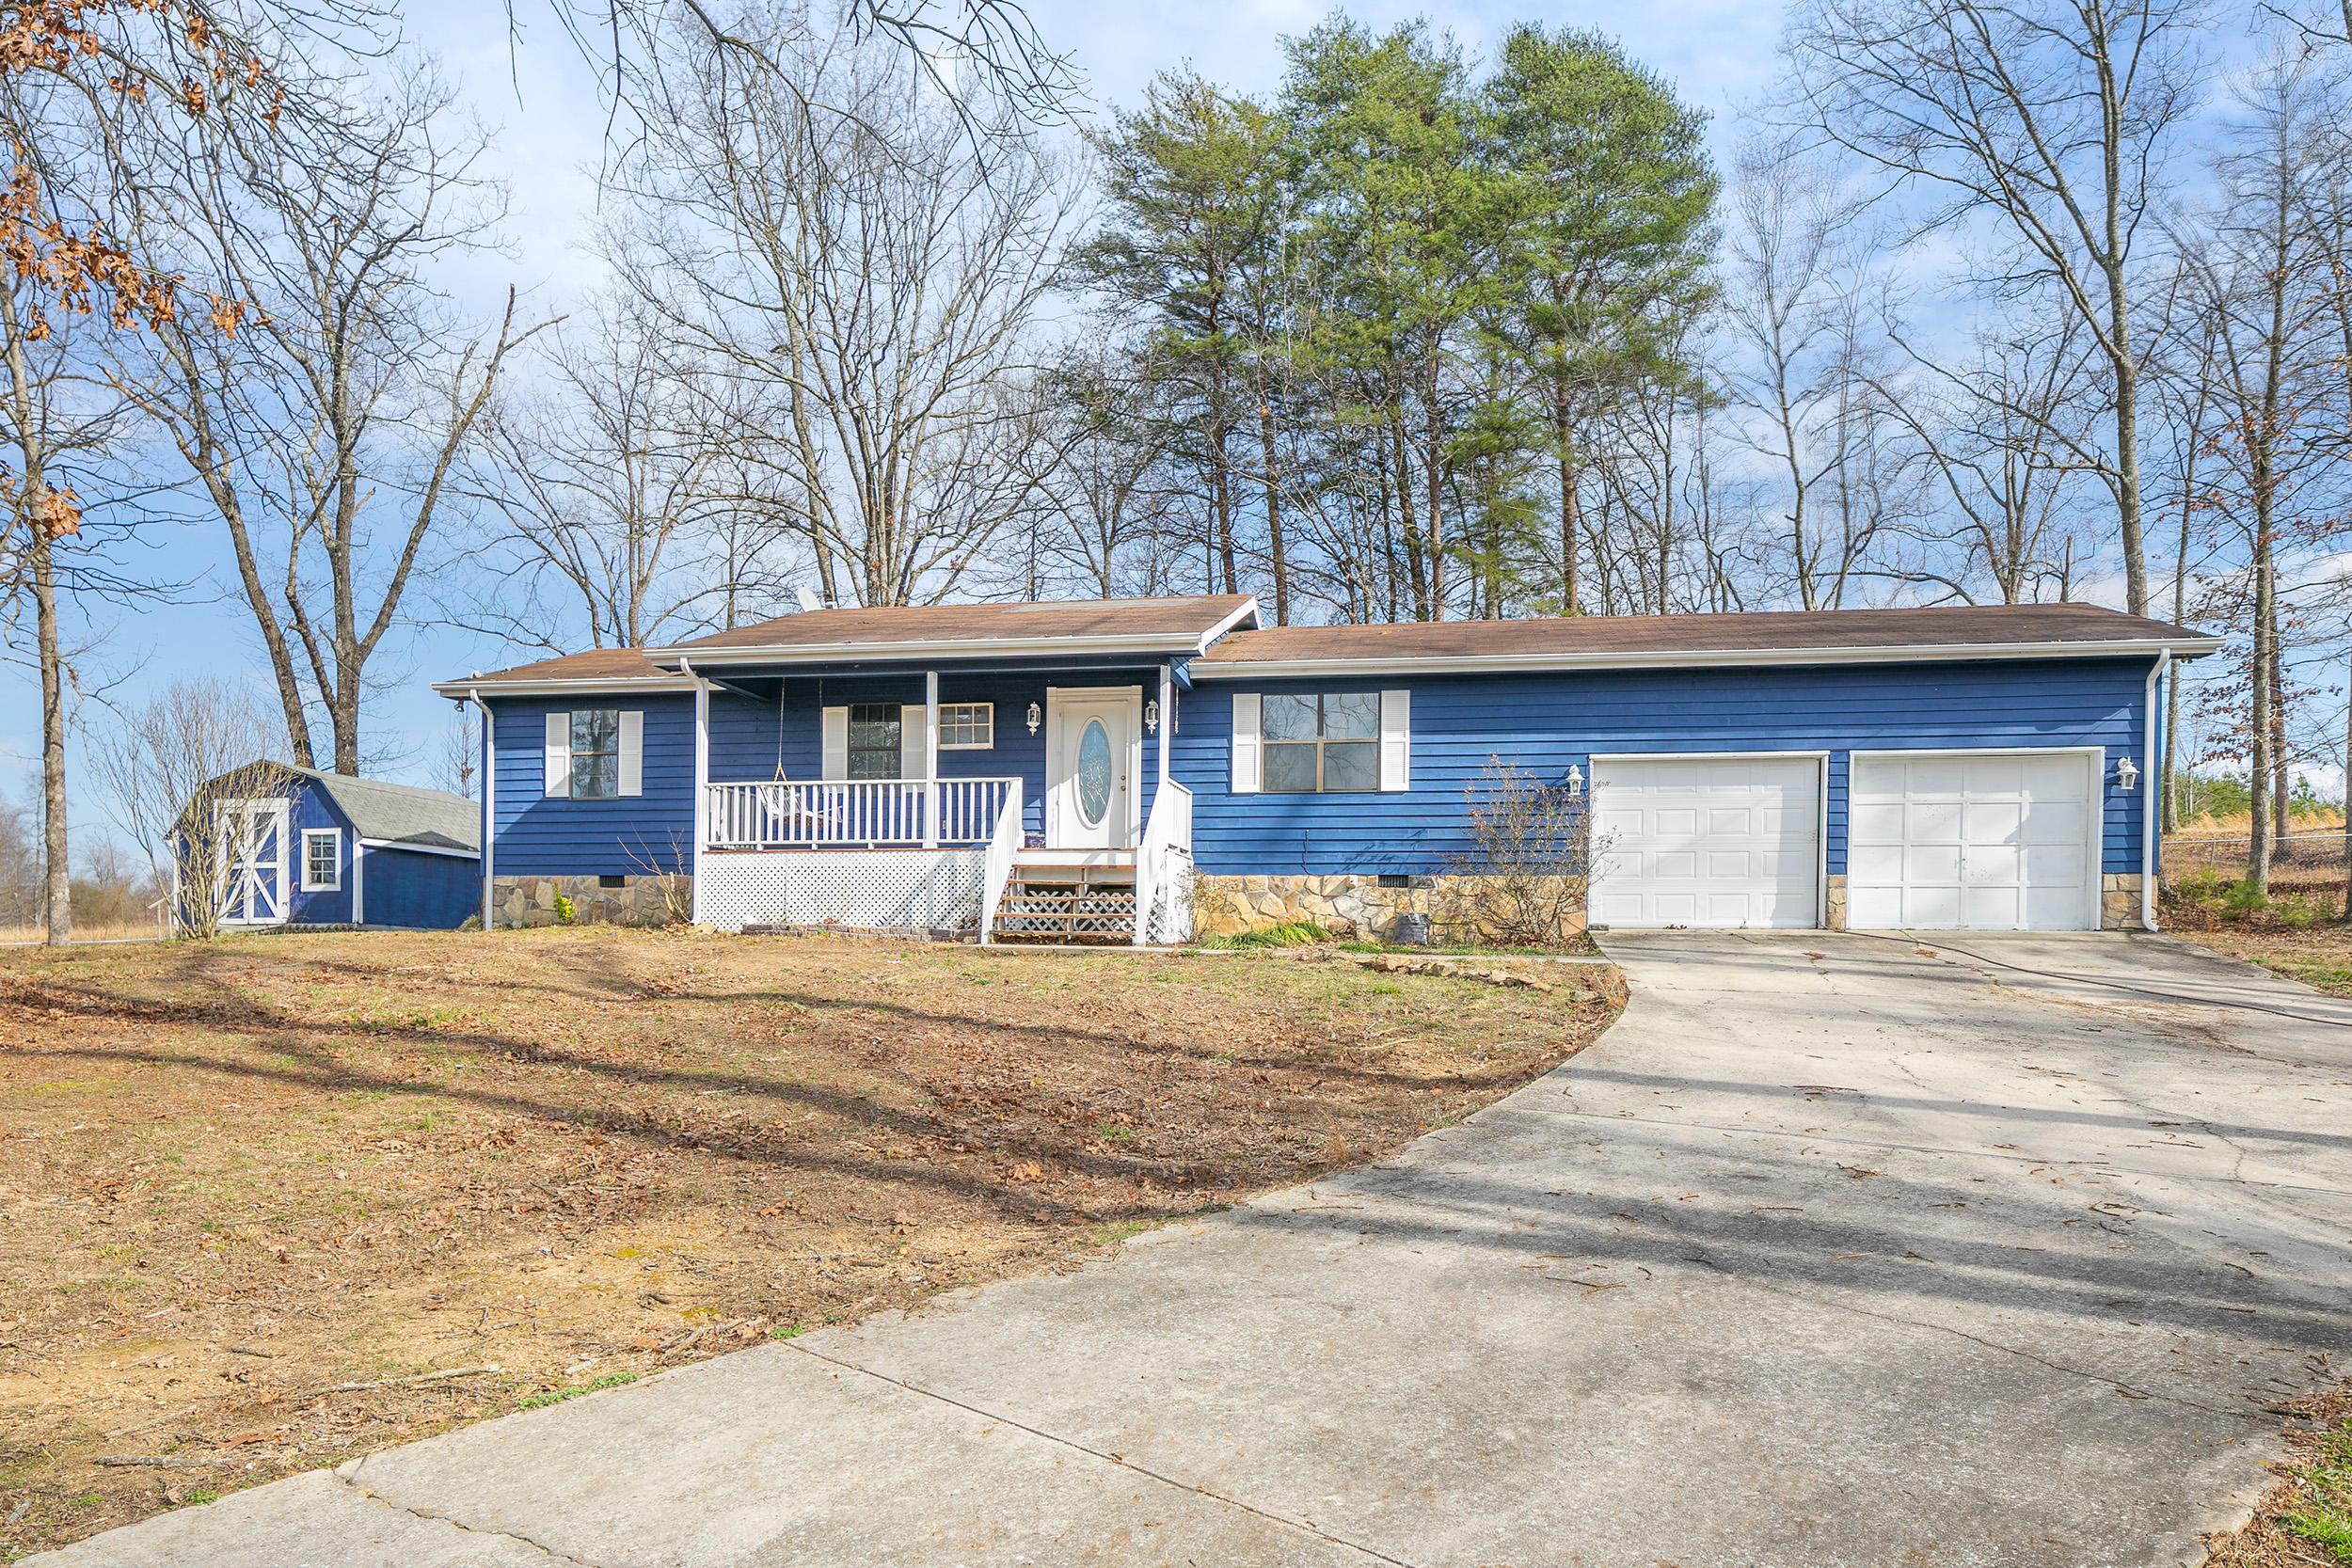 167 Springlake Dr, Trenton, GA 30752